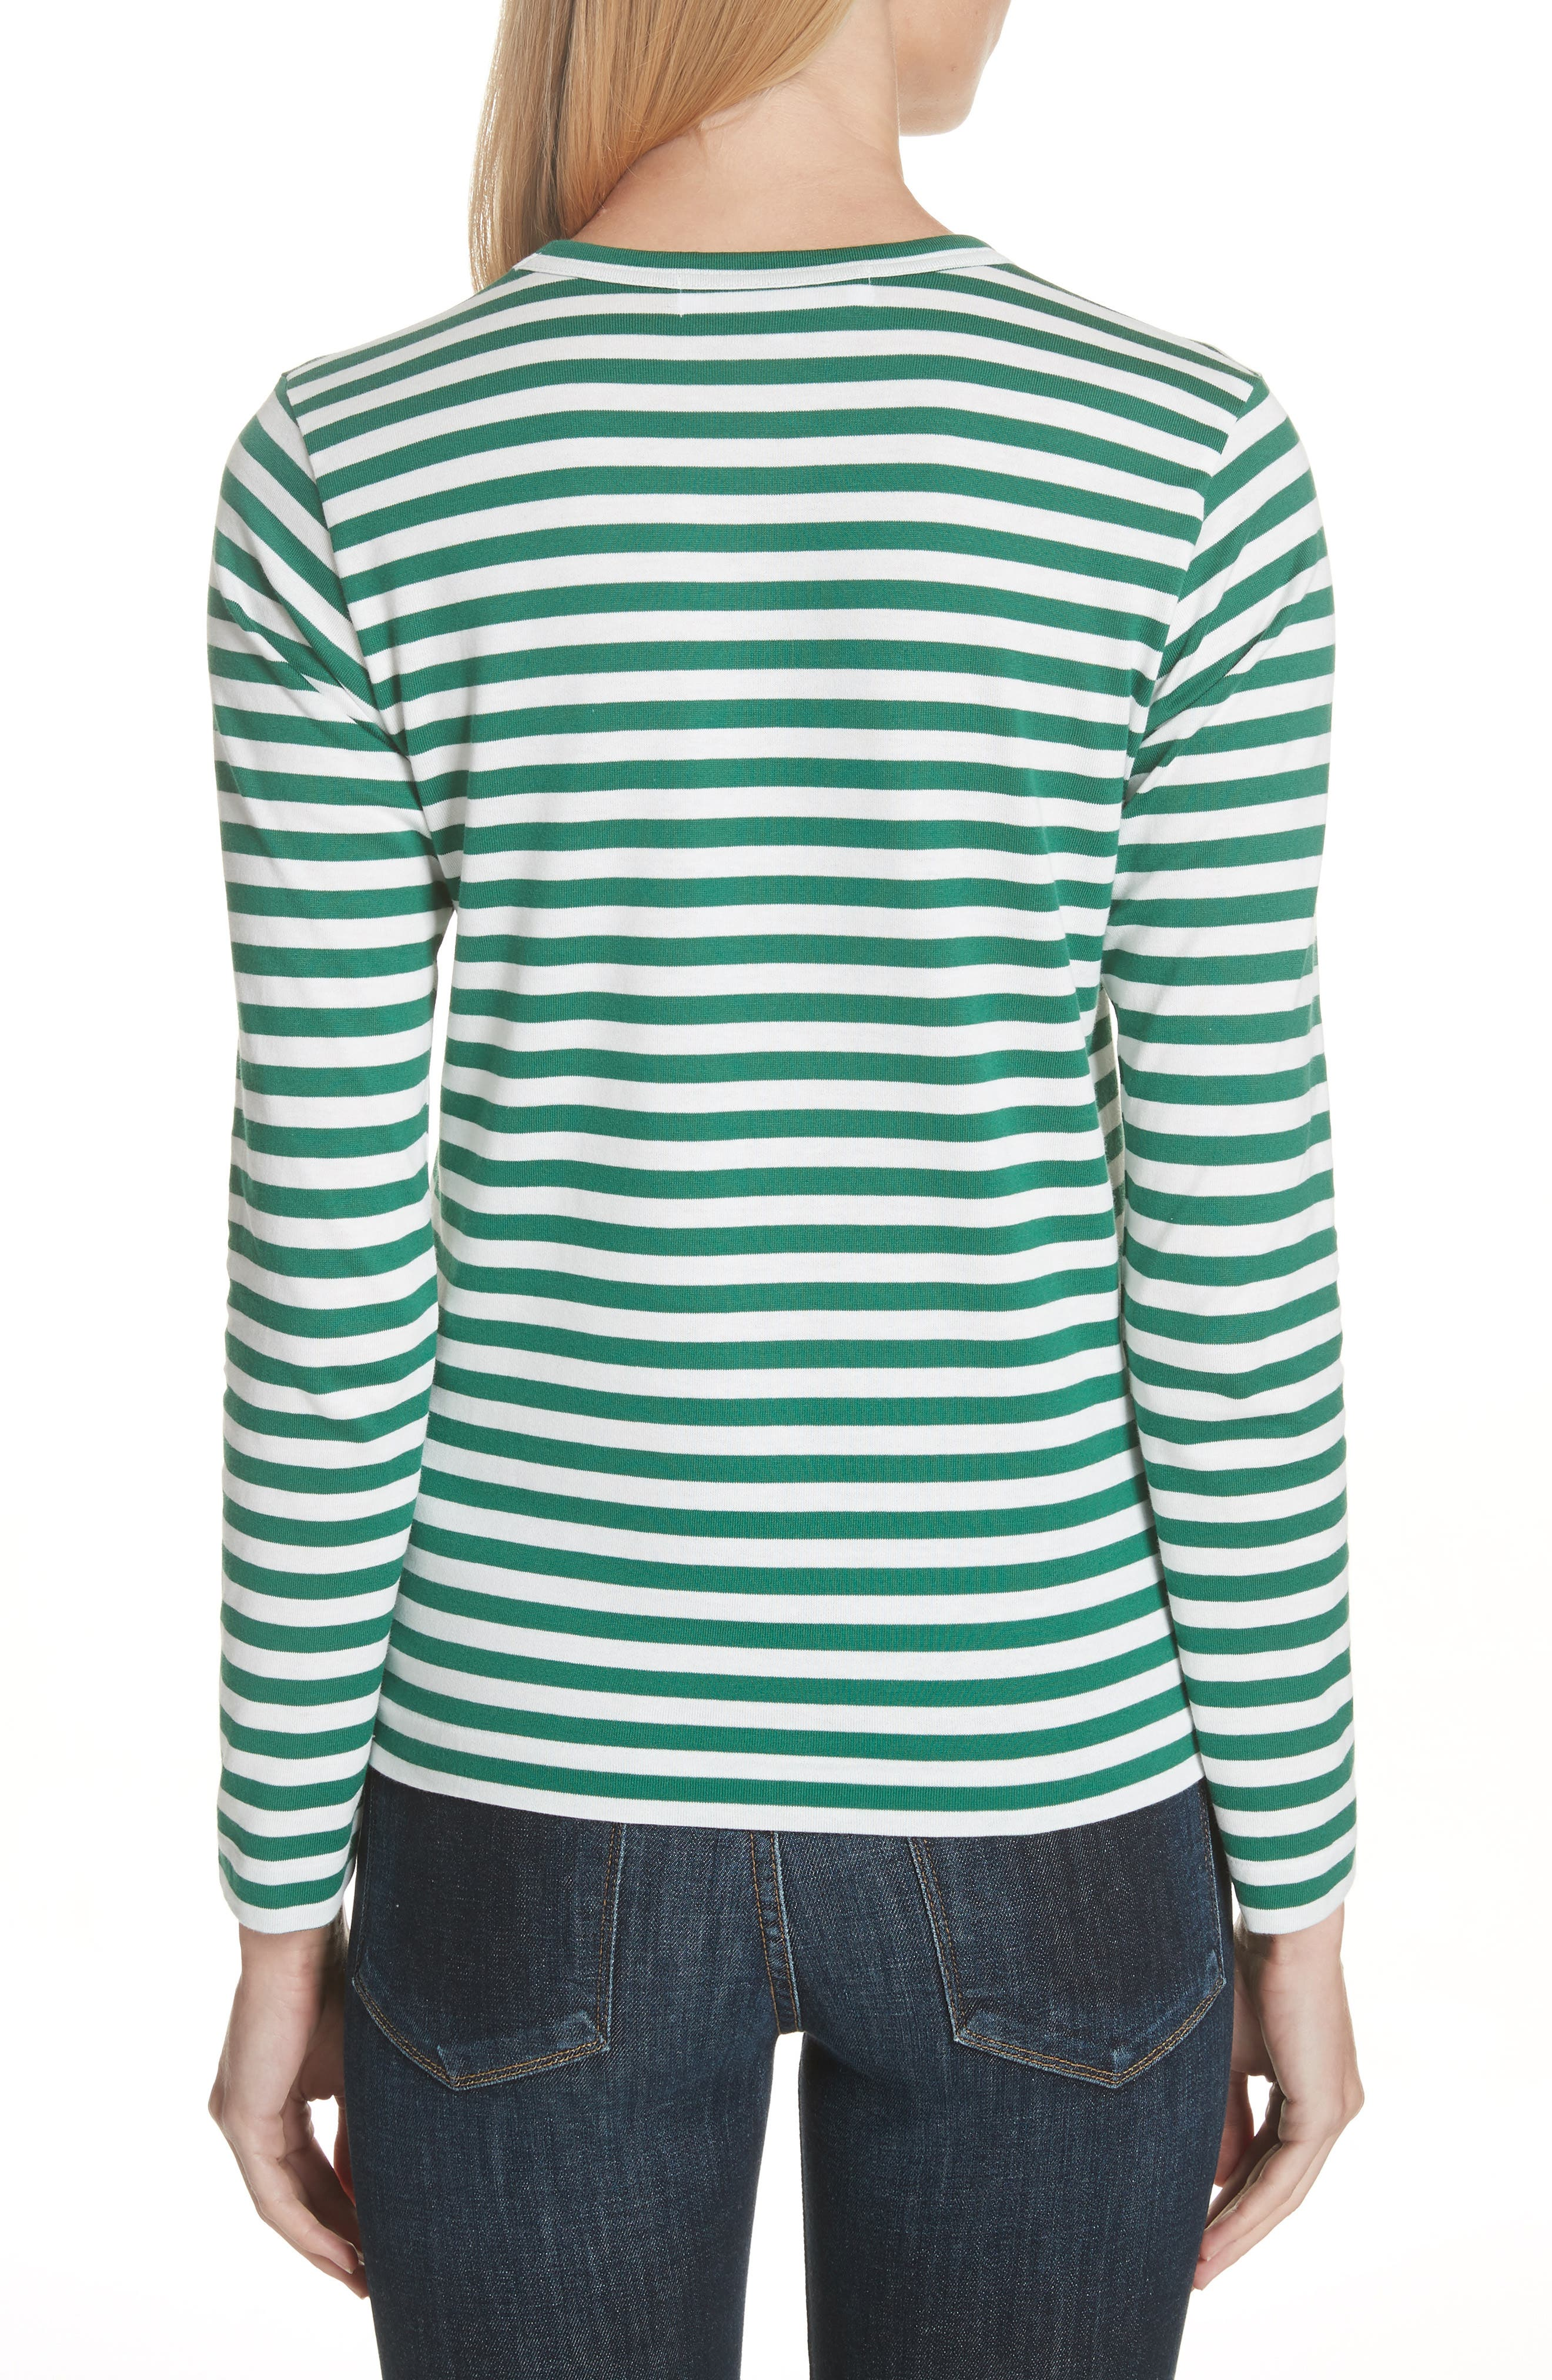 Comme des Garçons PLAY Stripe Cotton Tee,                             Alternate thumbnail 2, color,                             GREEN/ WHITE